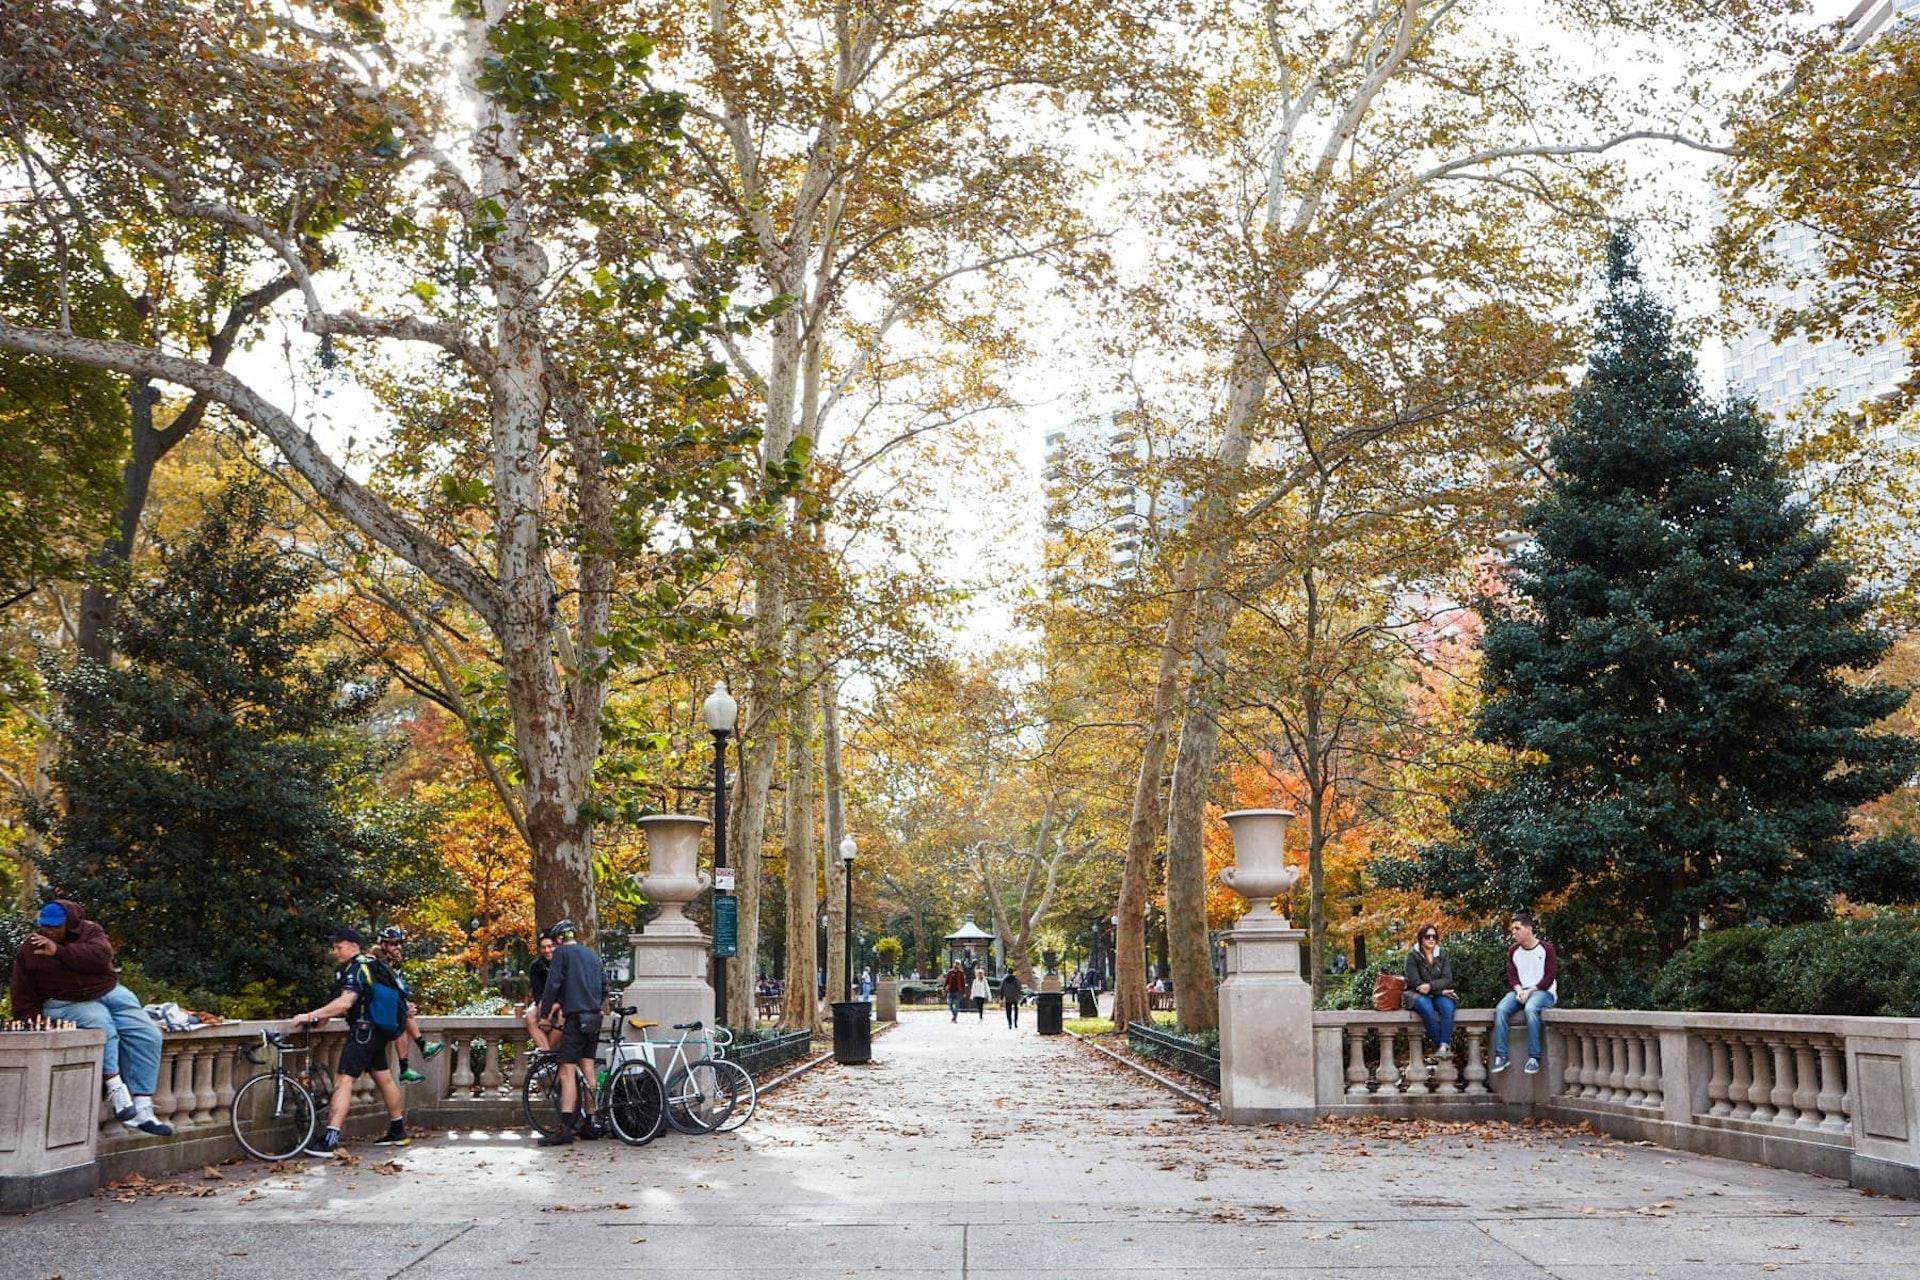 Walkway in park, Philadelphia